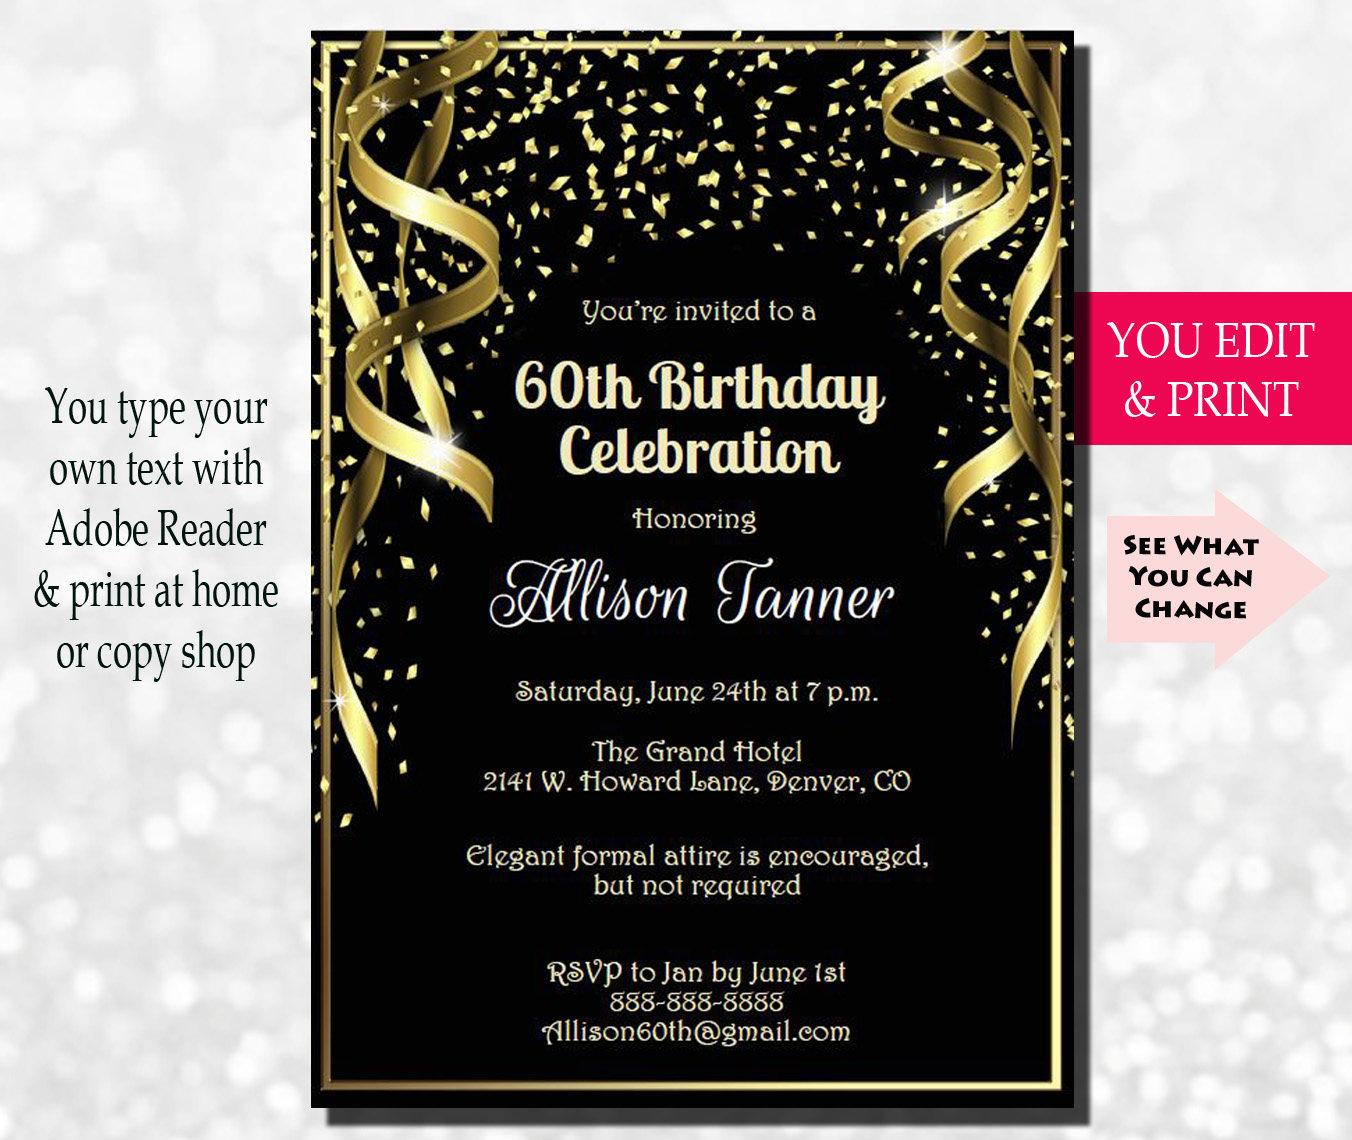 60th Birthday Invitation 60th Birthday Party Invitation